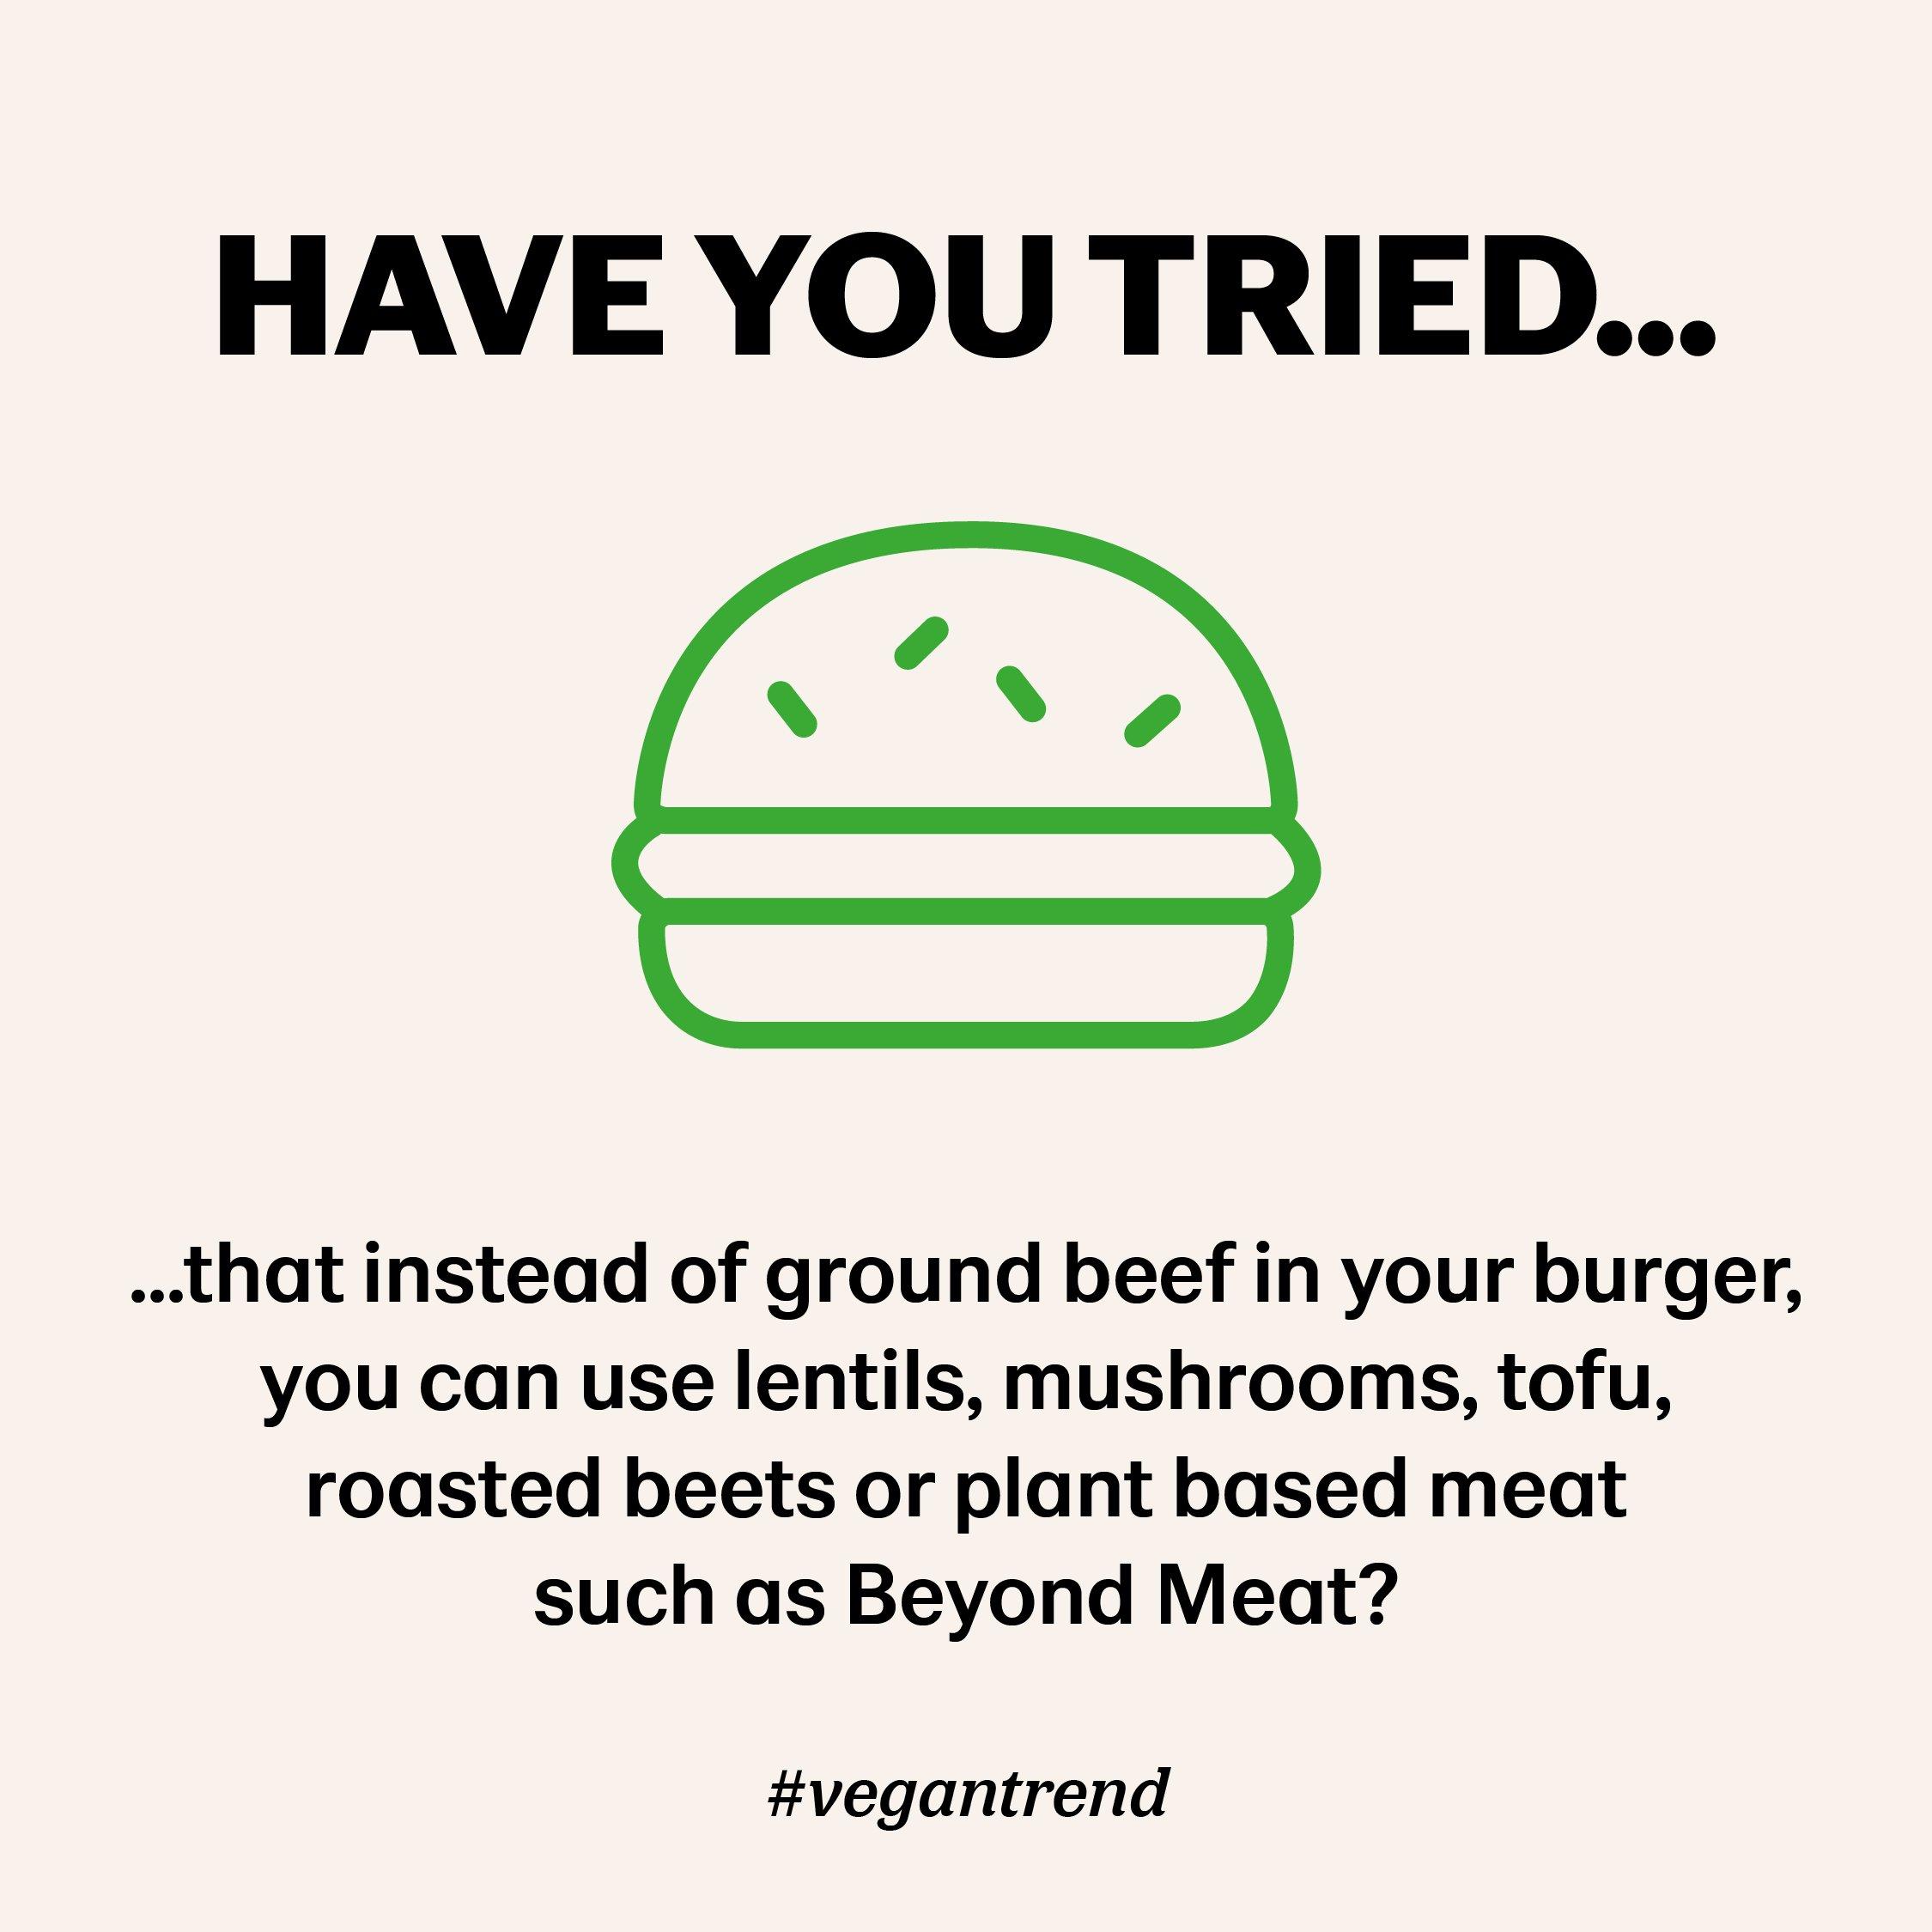 Meat free vegan burger